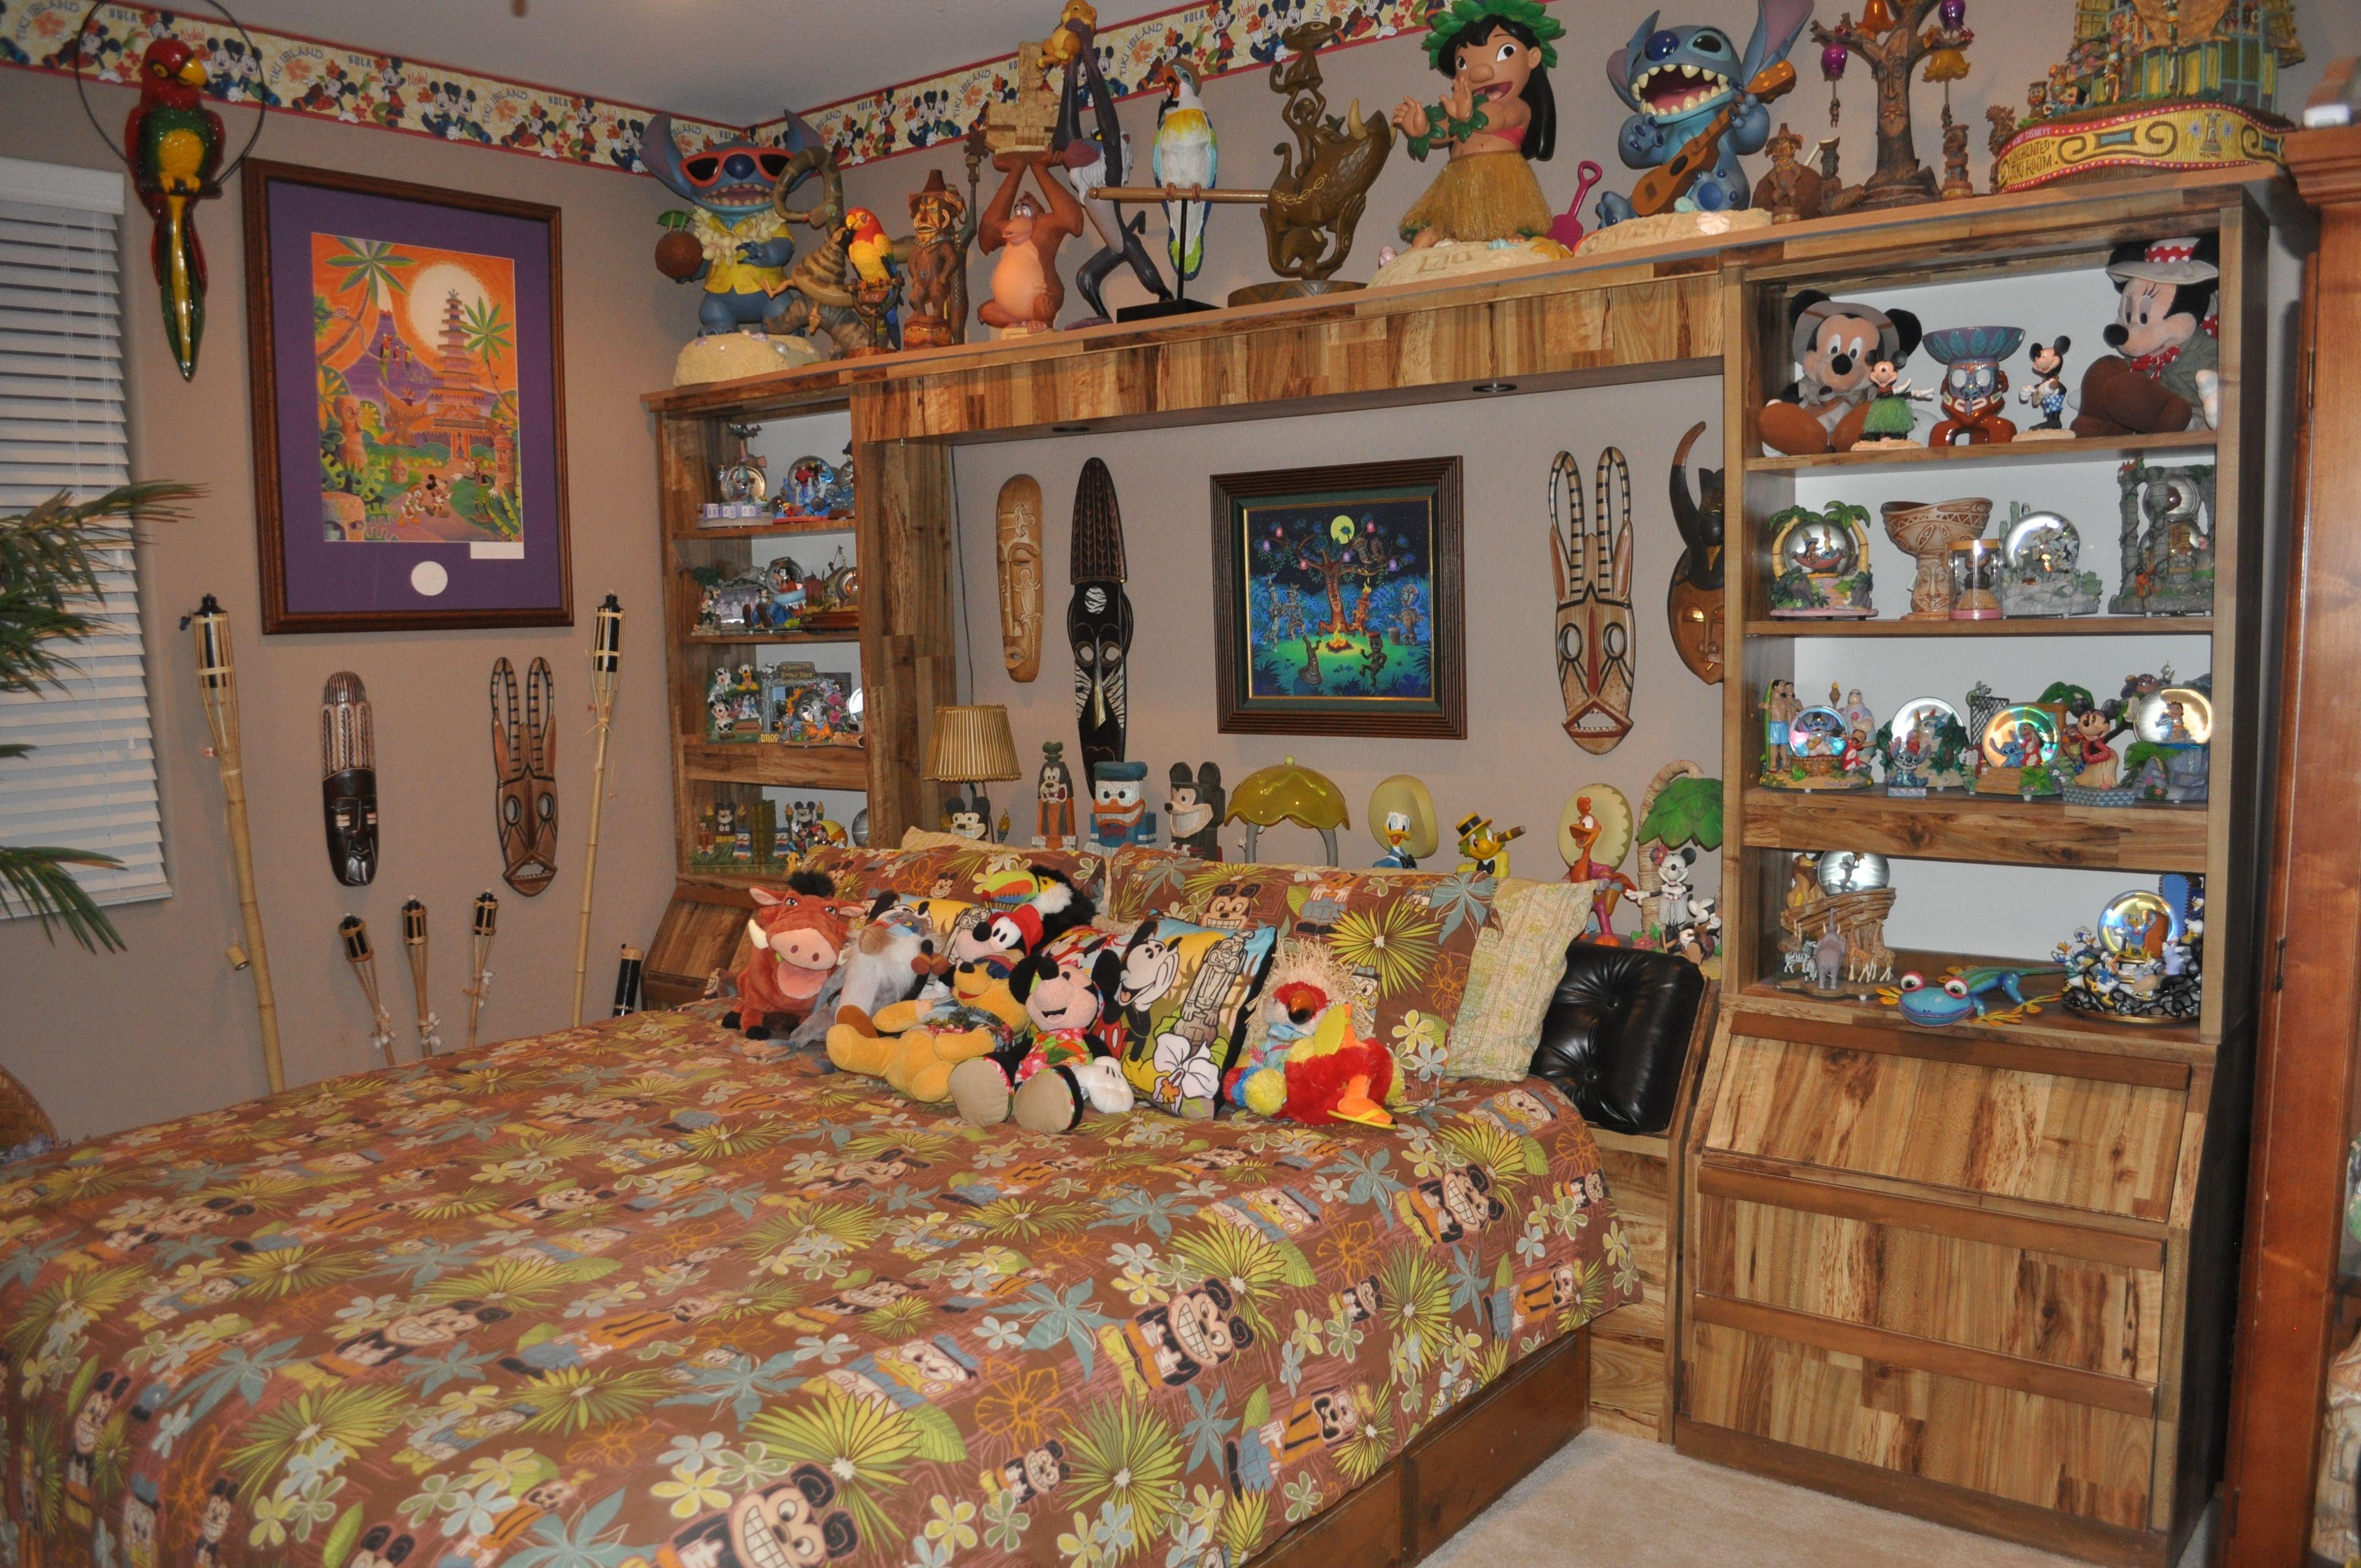 Big Family Room Decorating Ideas